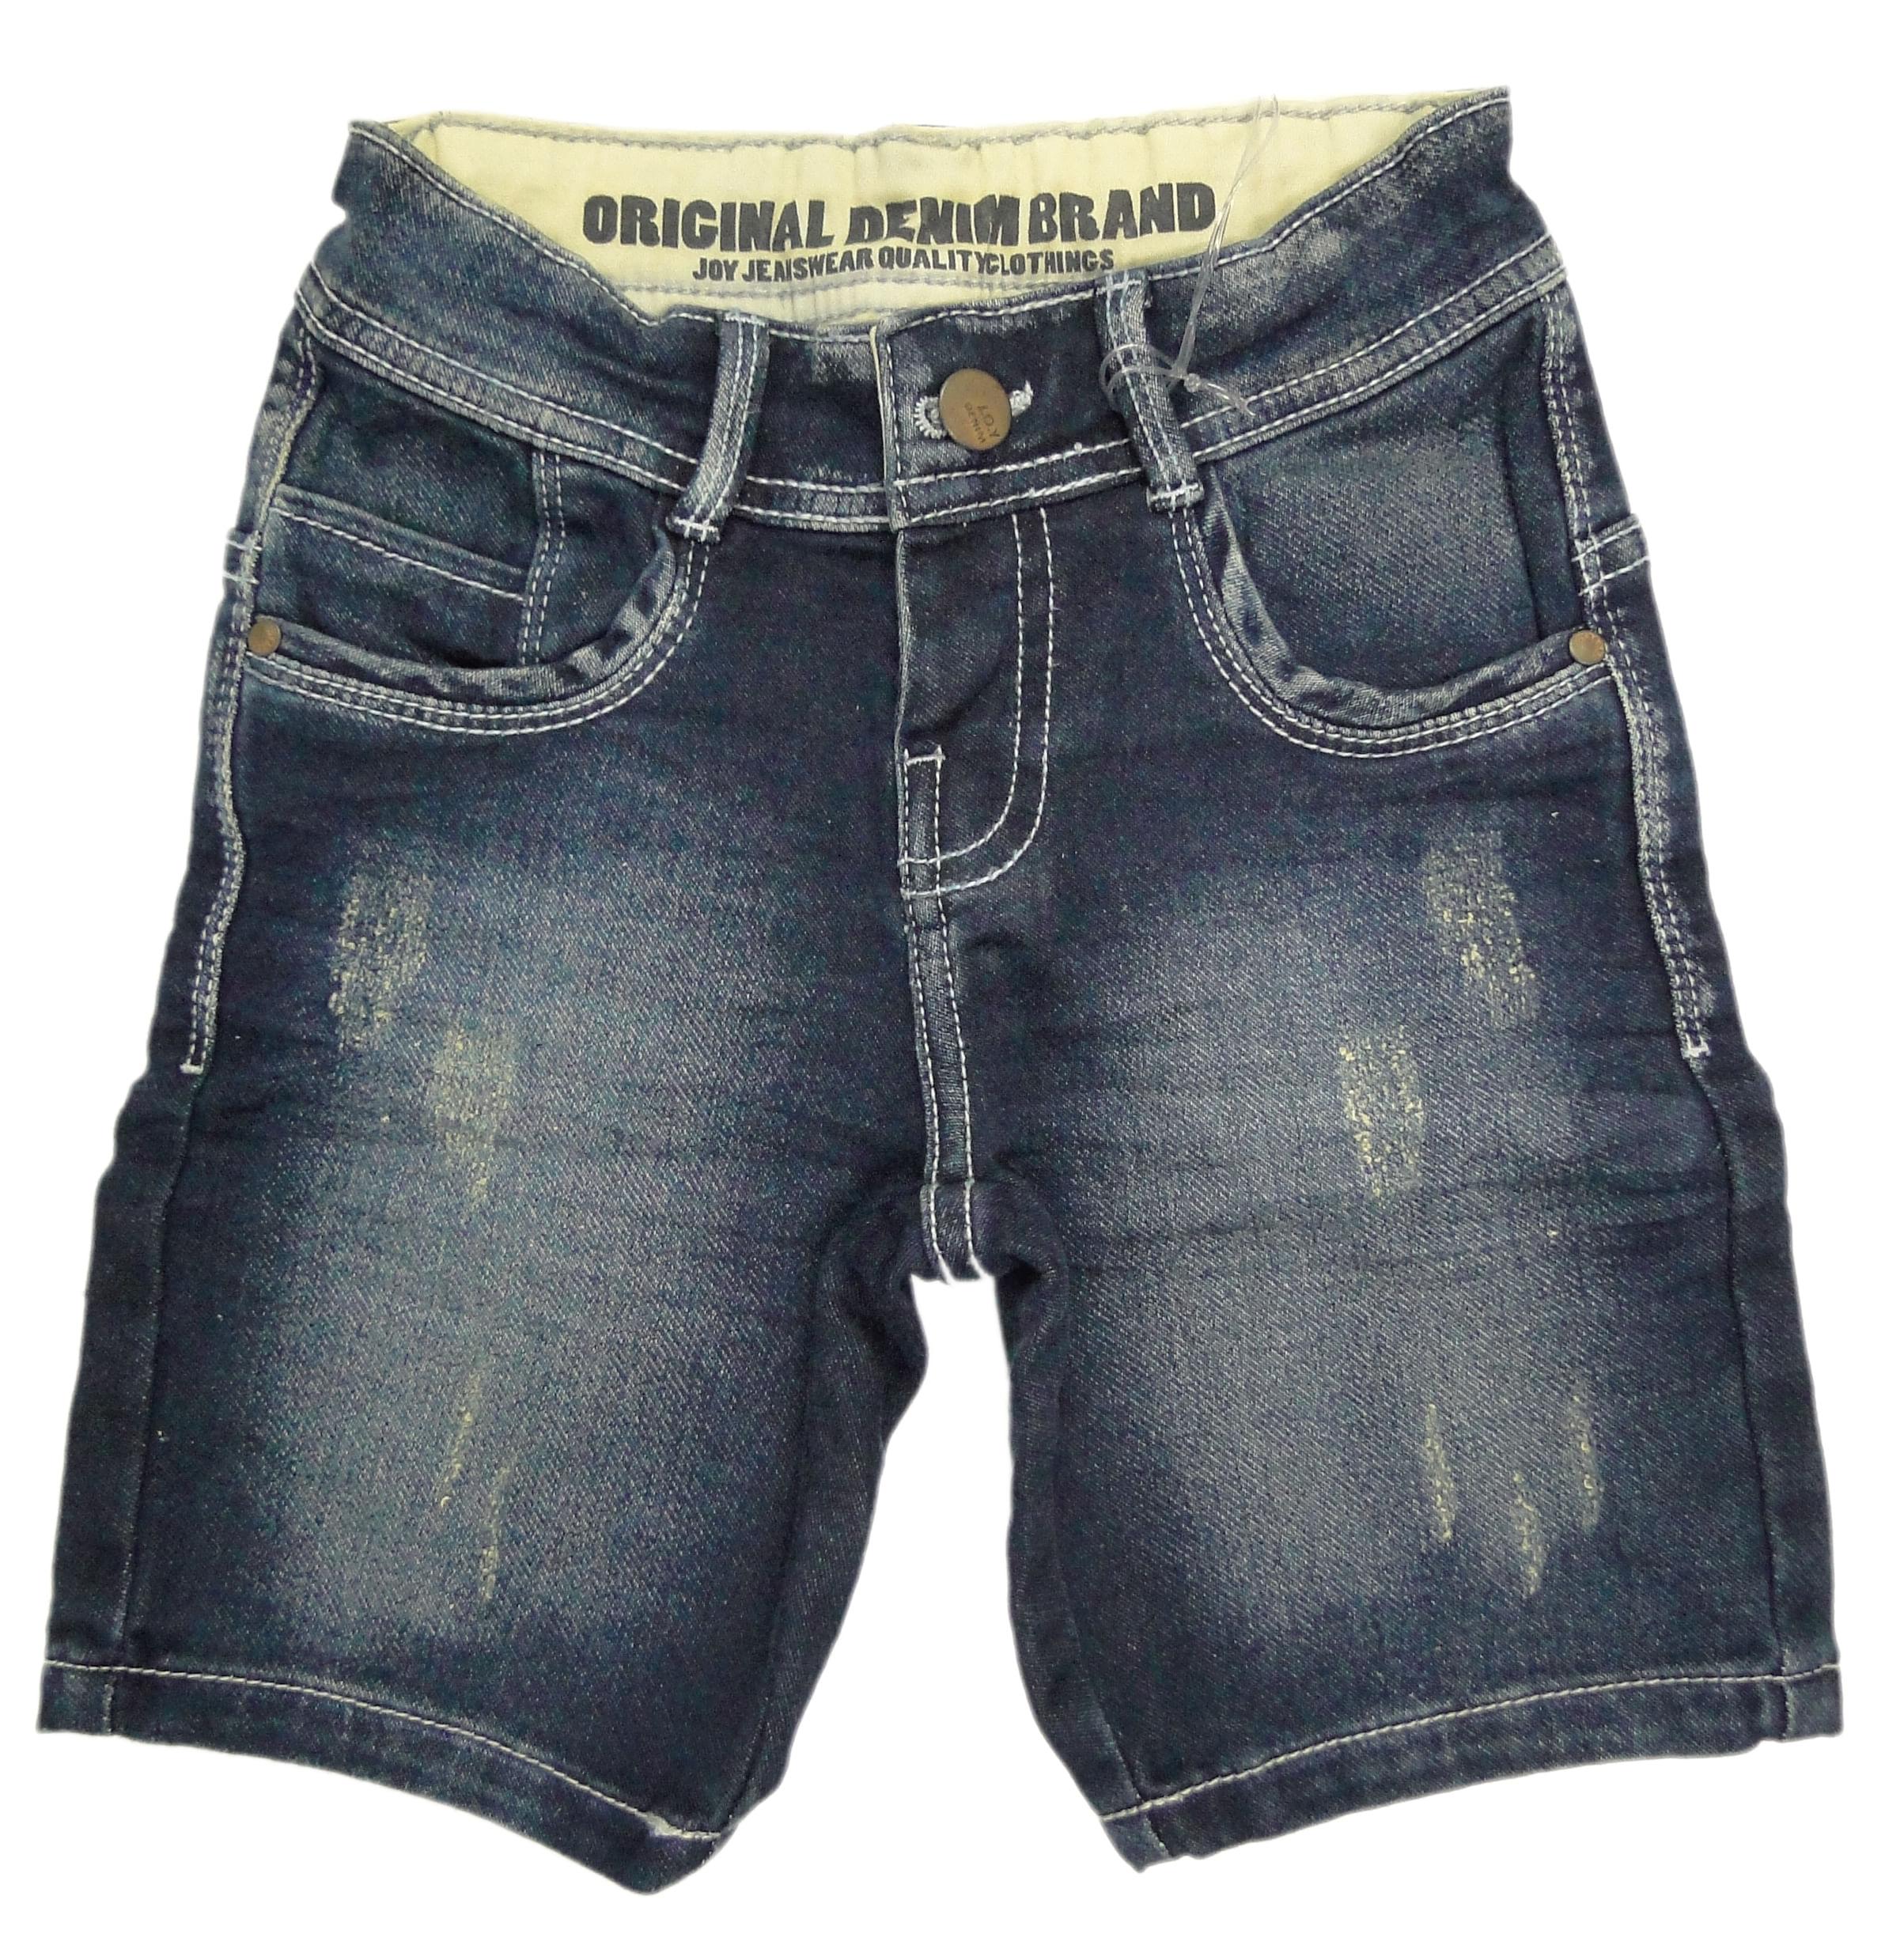 Bermuda Menino Jeans Escuro Detalhe Puído - Joy by Morena Rosa 3anos